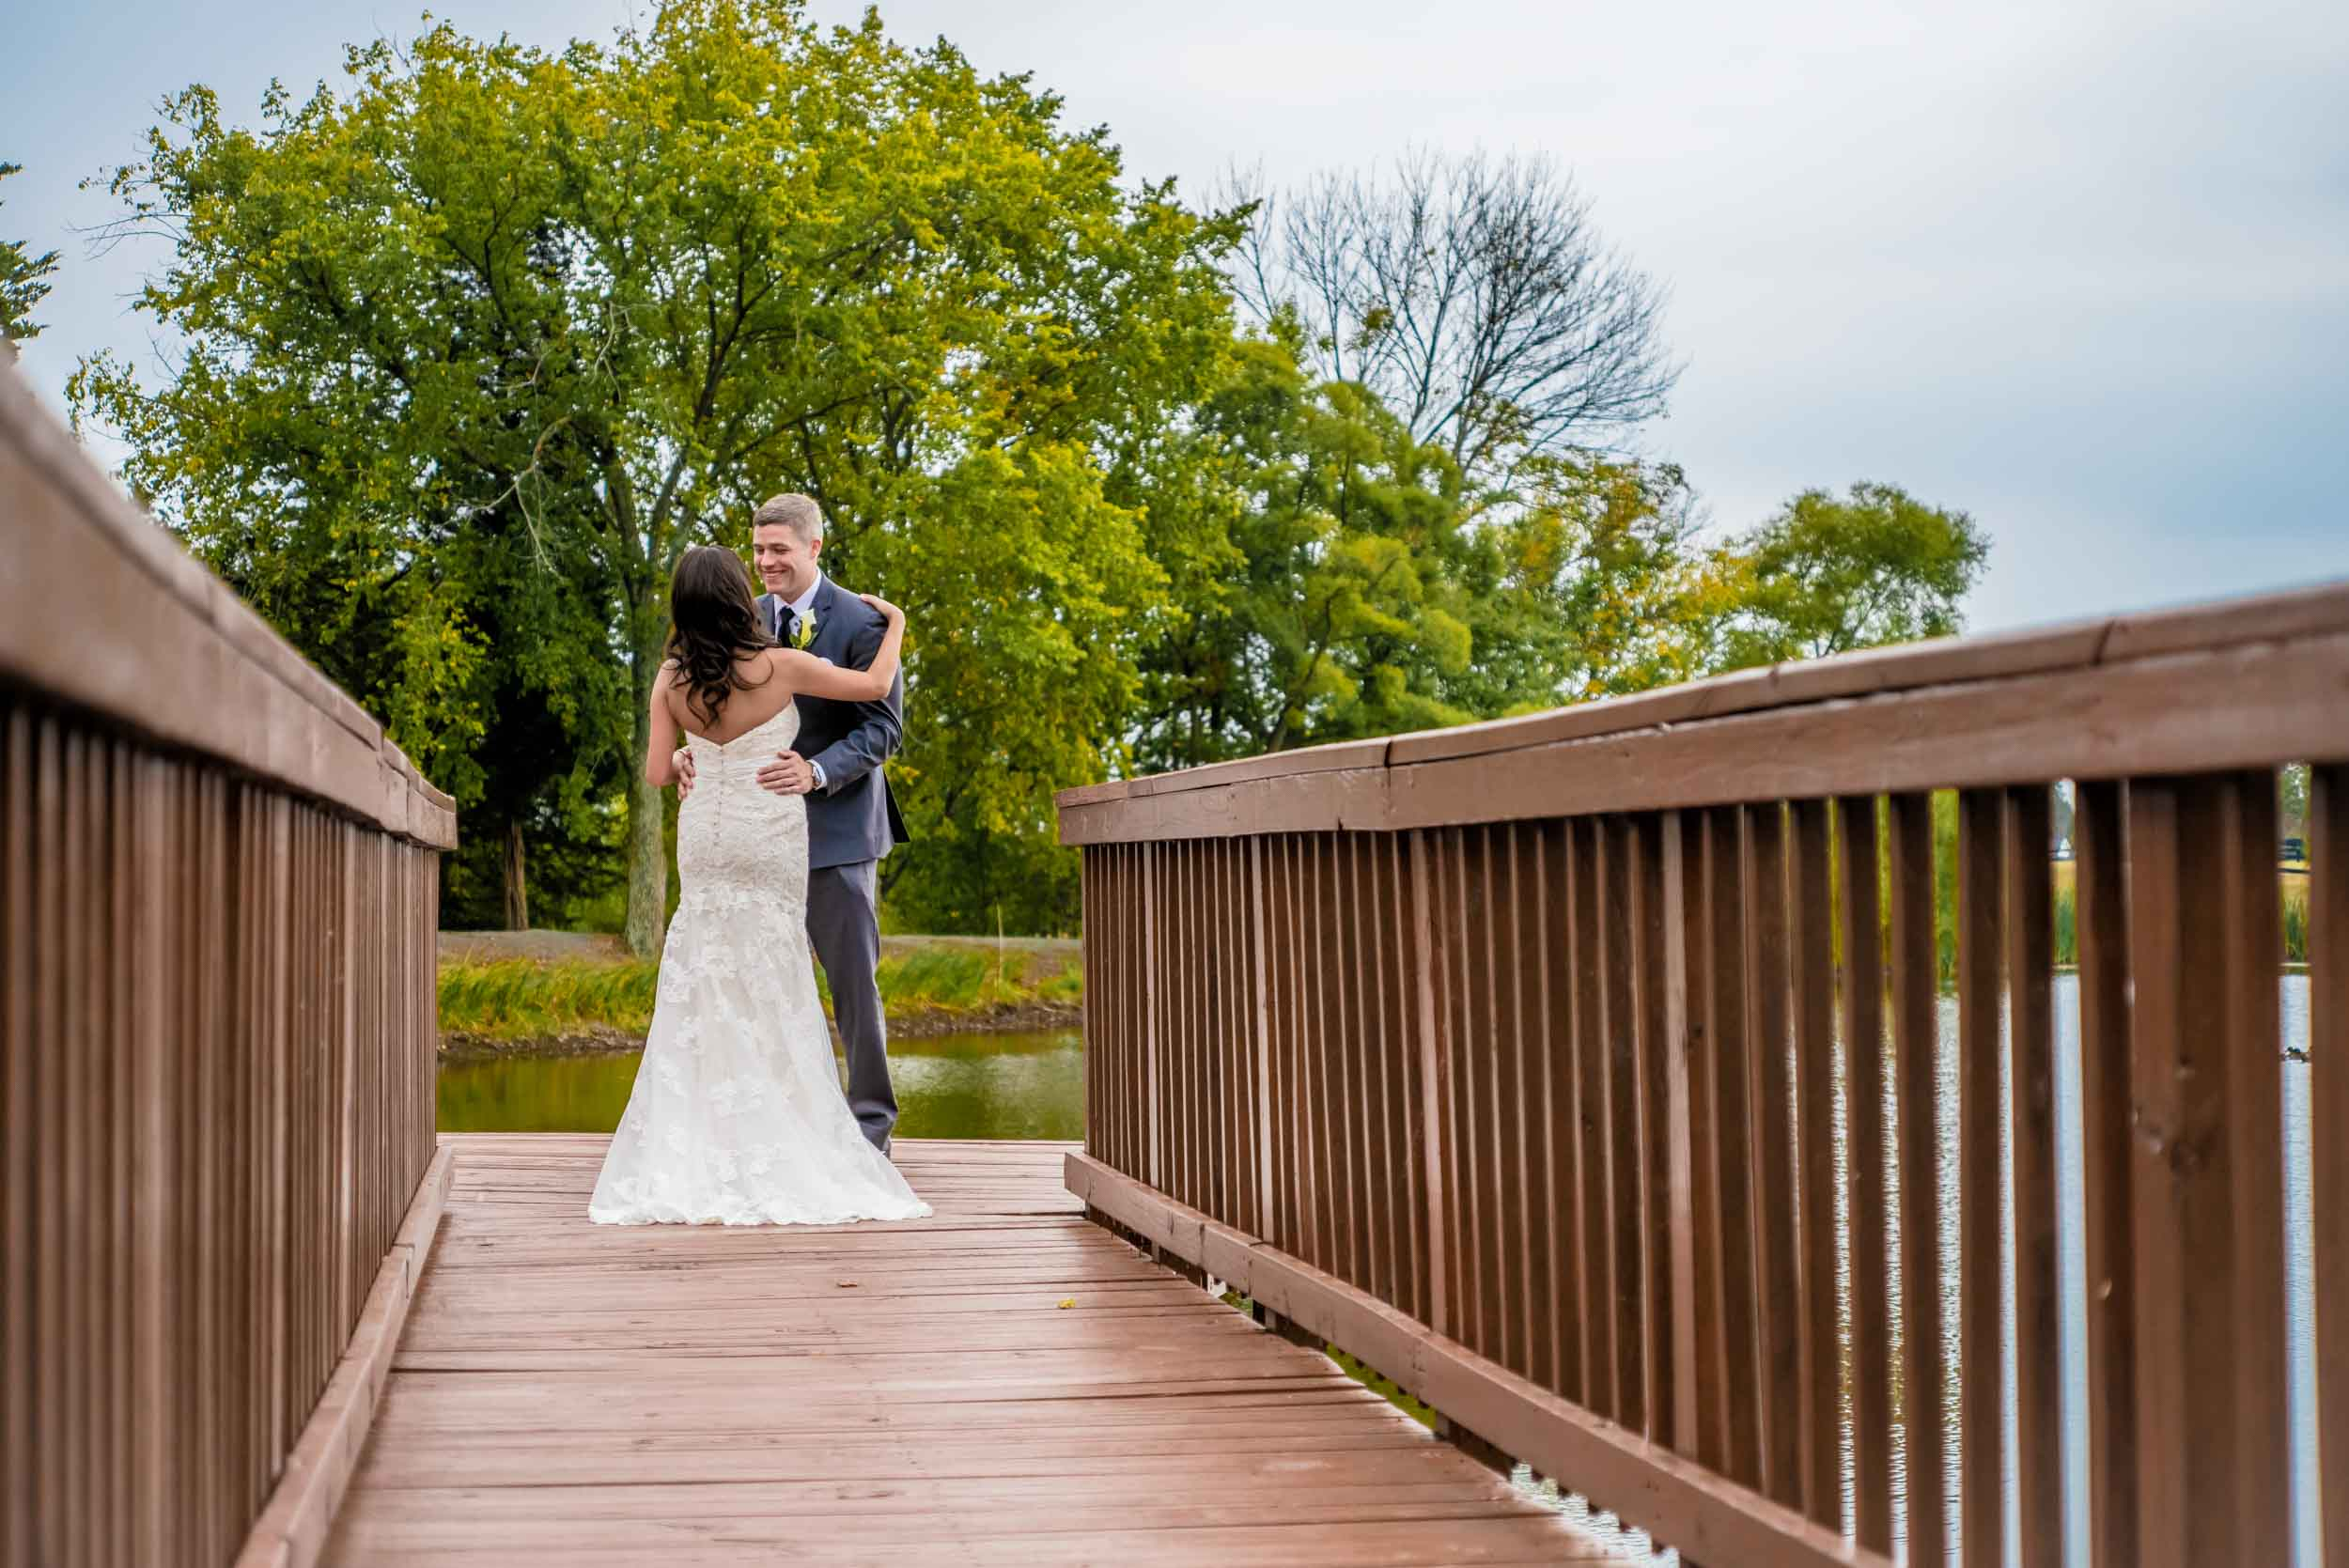 dc+metro+wedding+photographer+vadym+guliuk+photography+weddings+first-look-2023.jpg